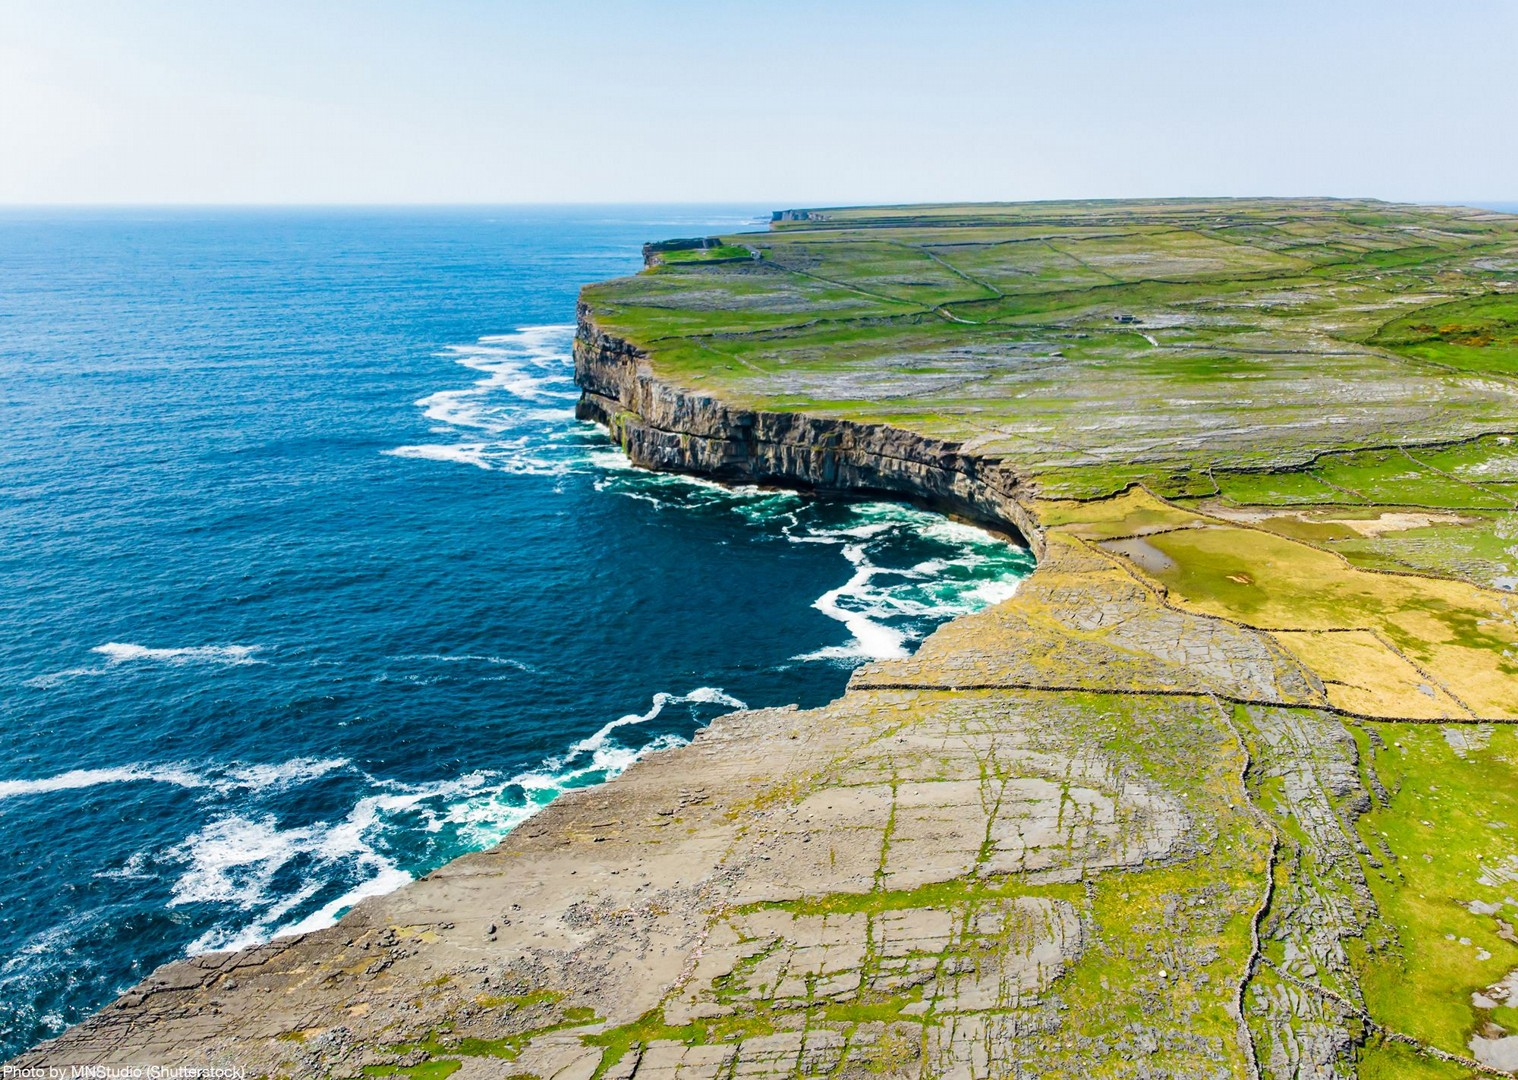 ireland-self-guided-cycling-irish-scenery-leisure-holiday.jpg - NEW! Ireland - Connemara and the Aran Isles - Leisure Cycling